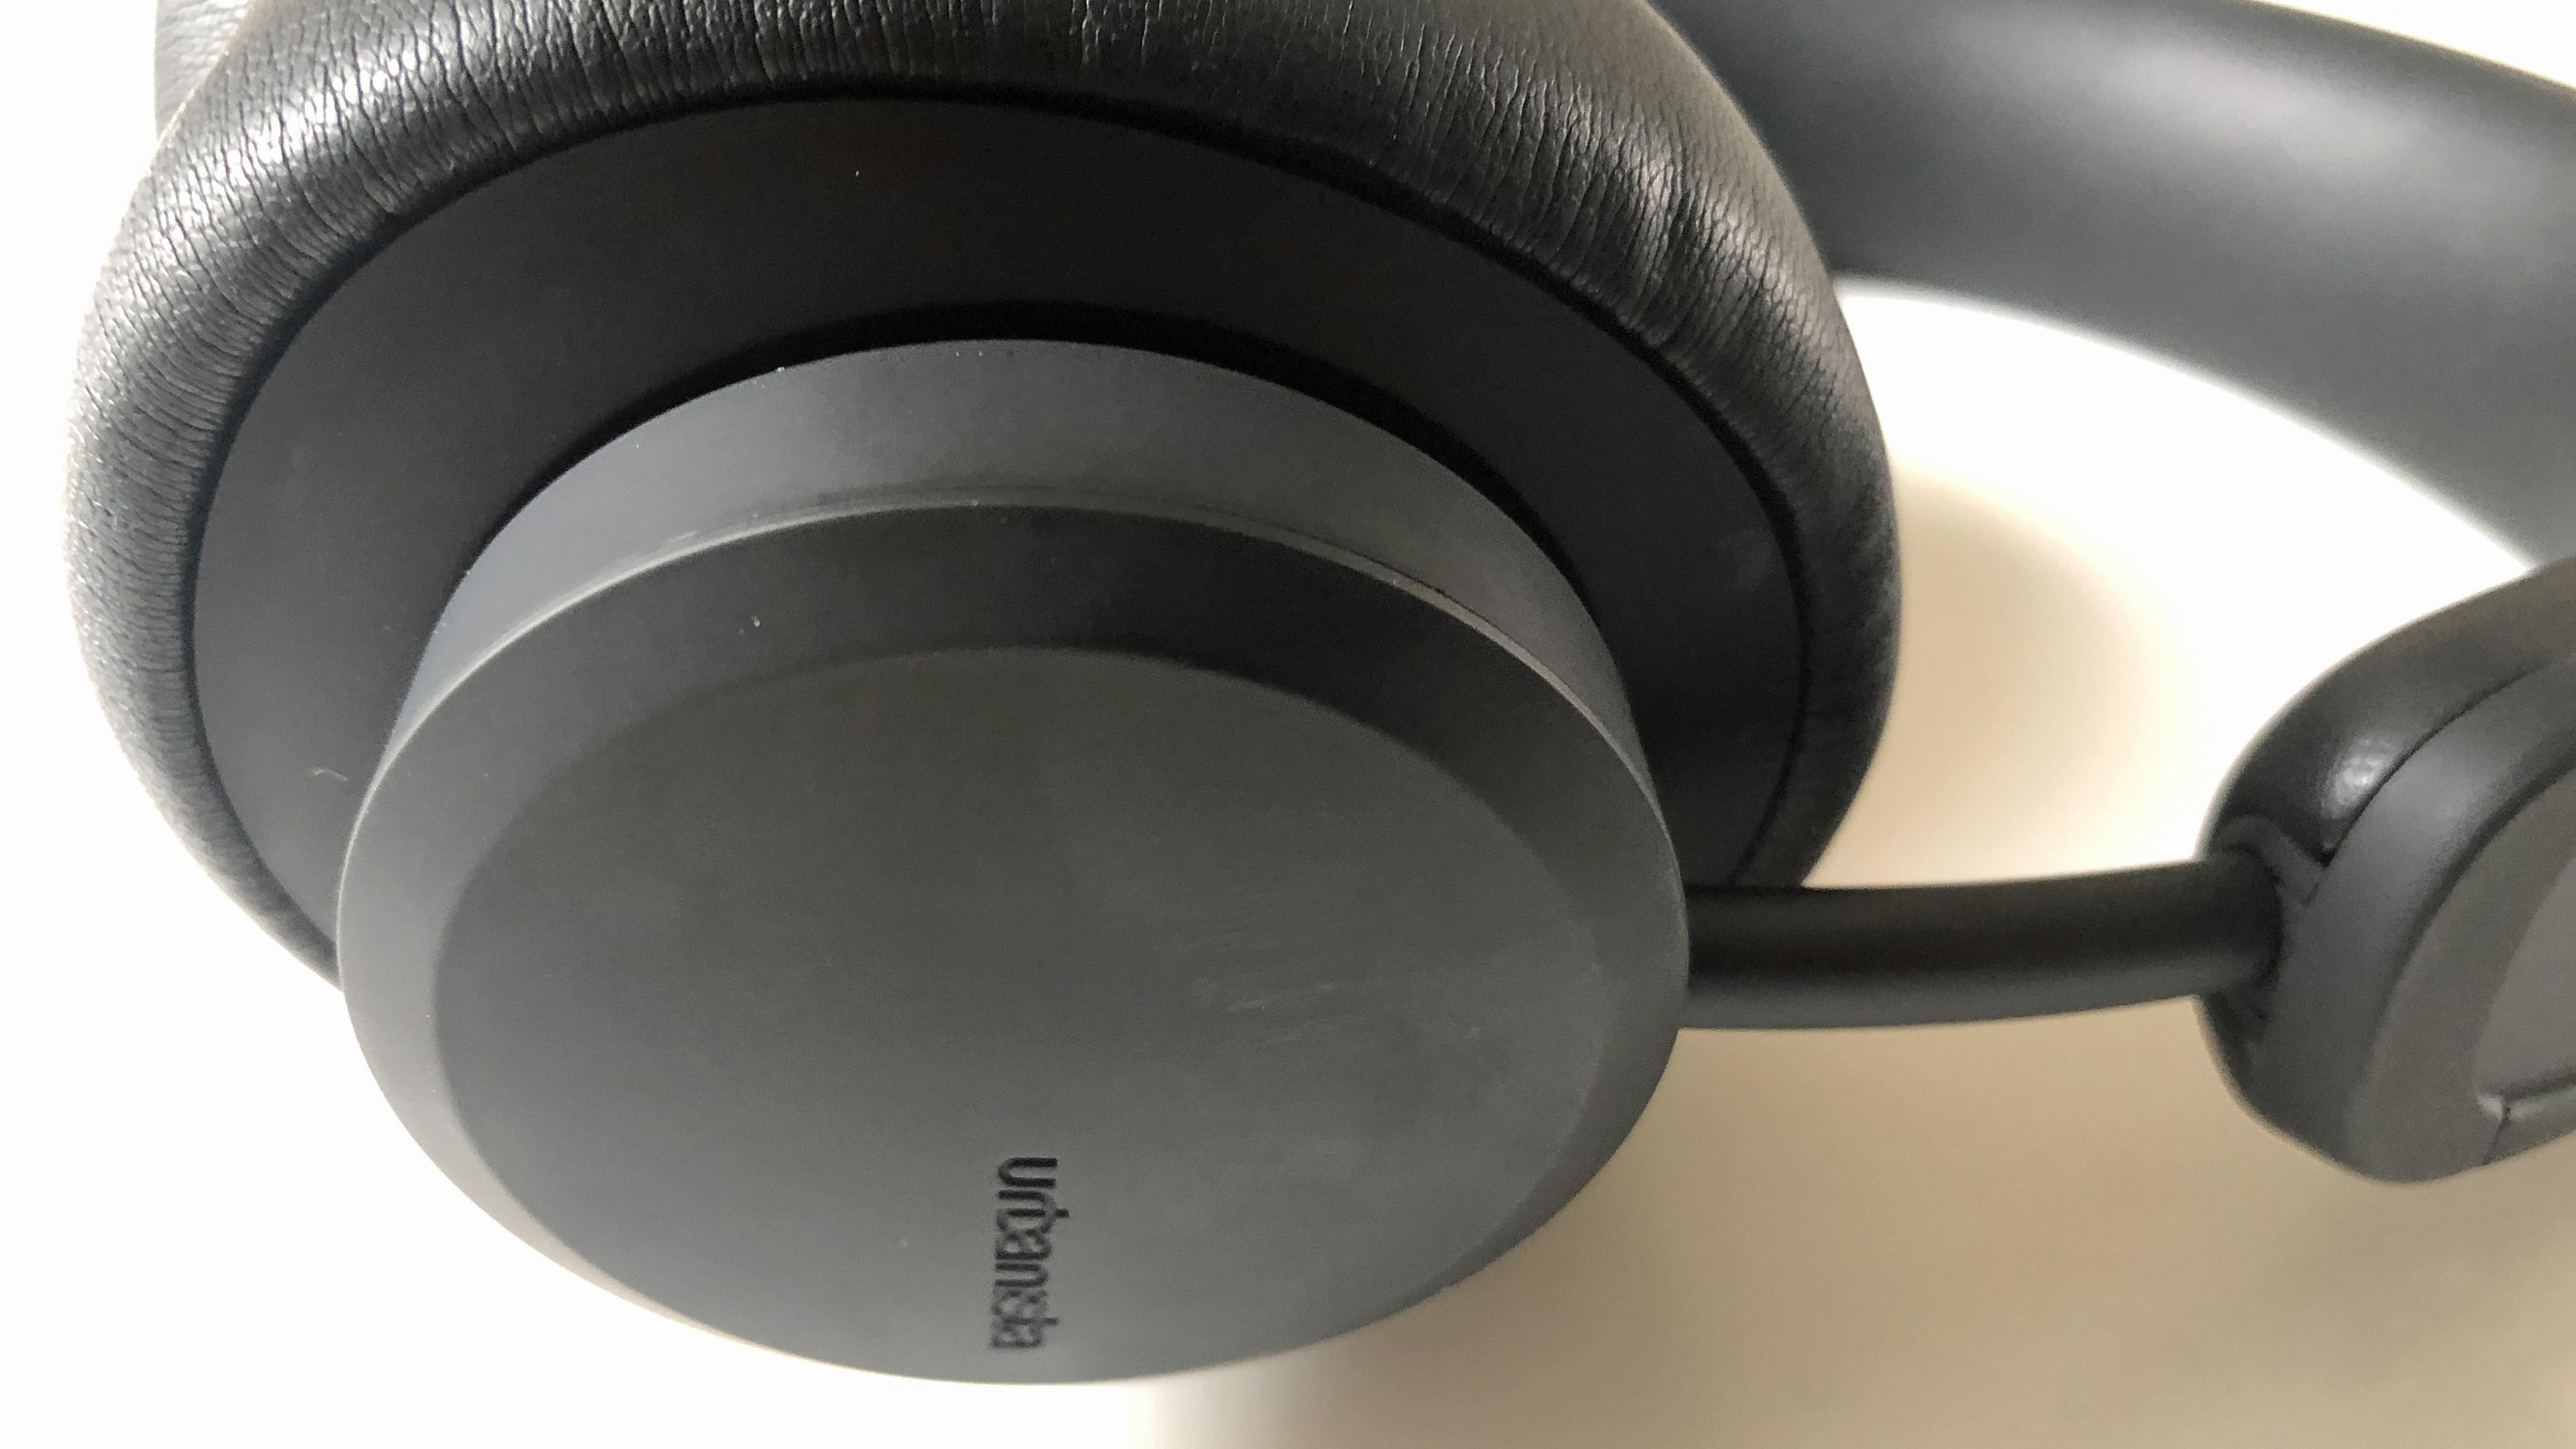 the earcups on the urbanista los angeles headphones